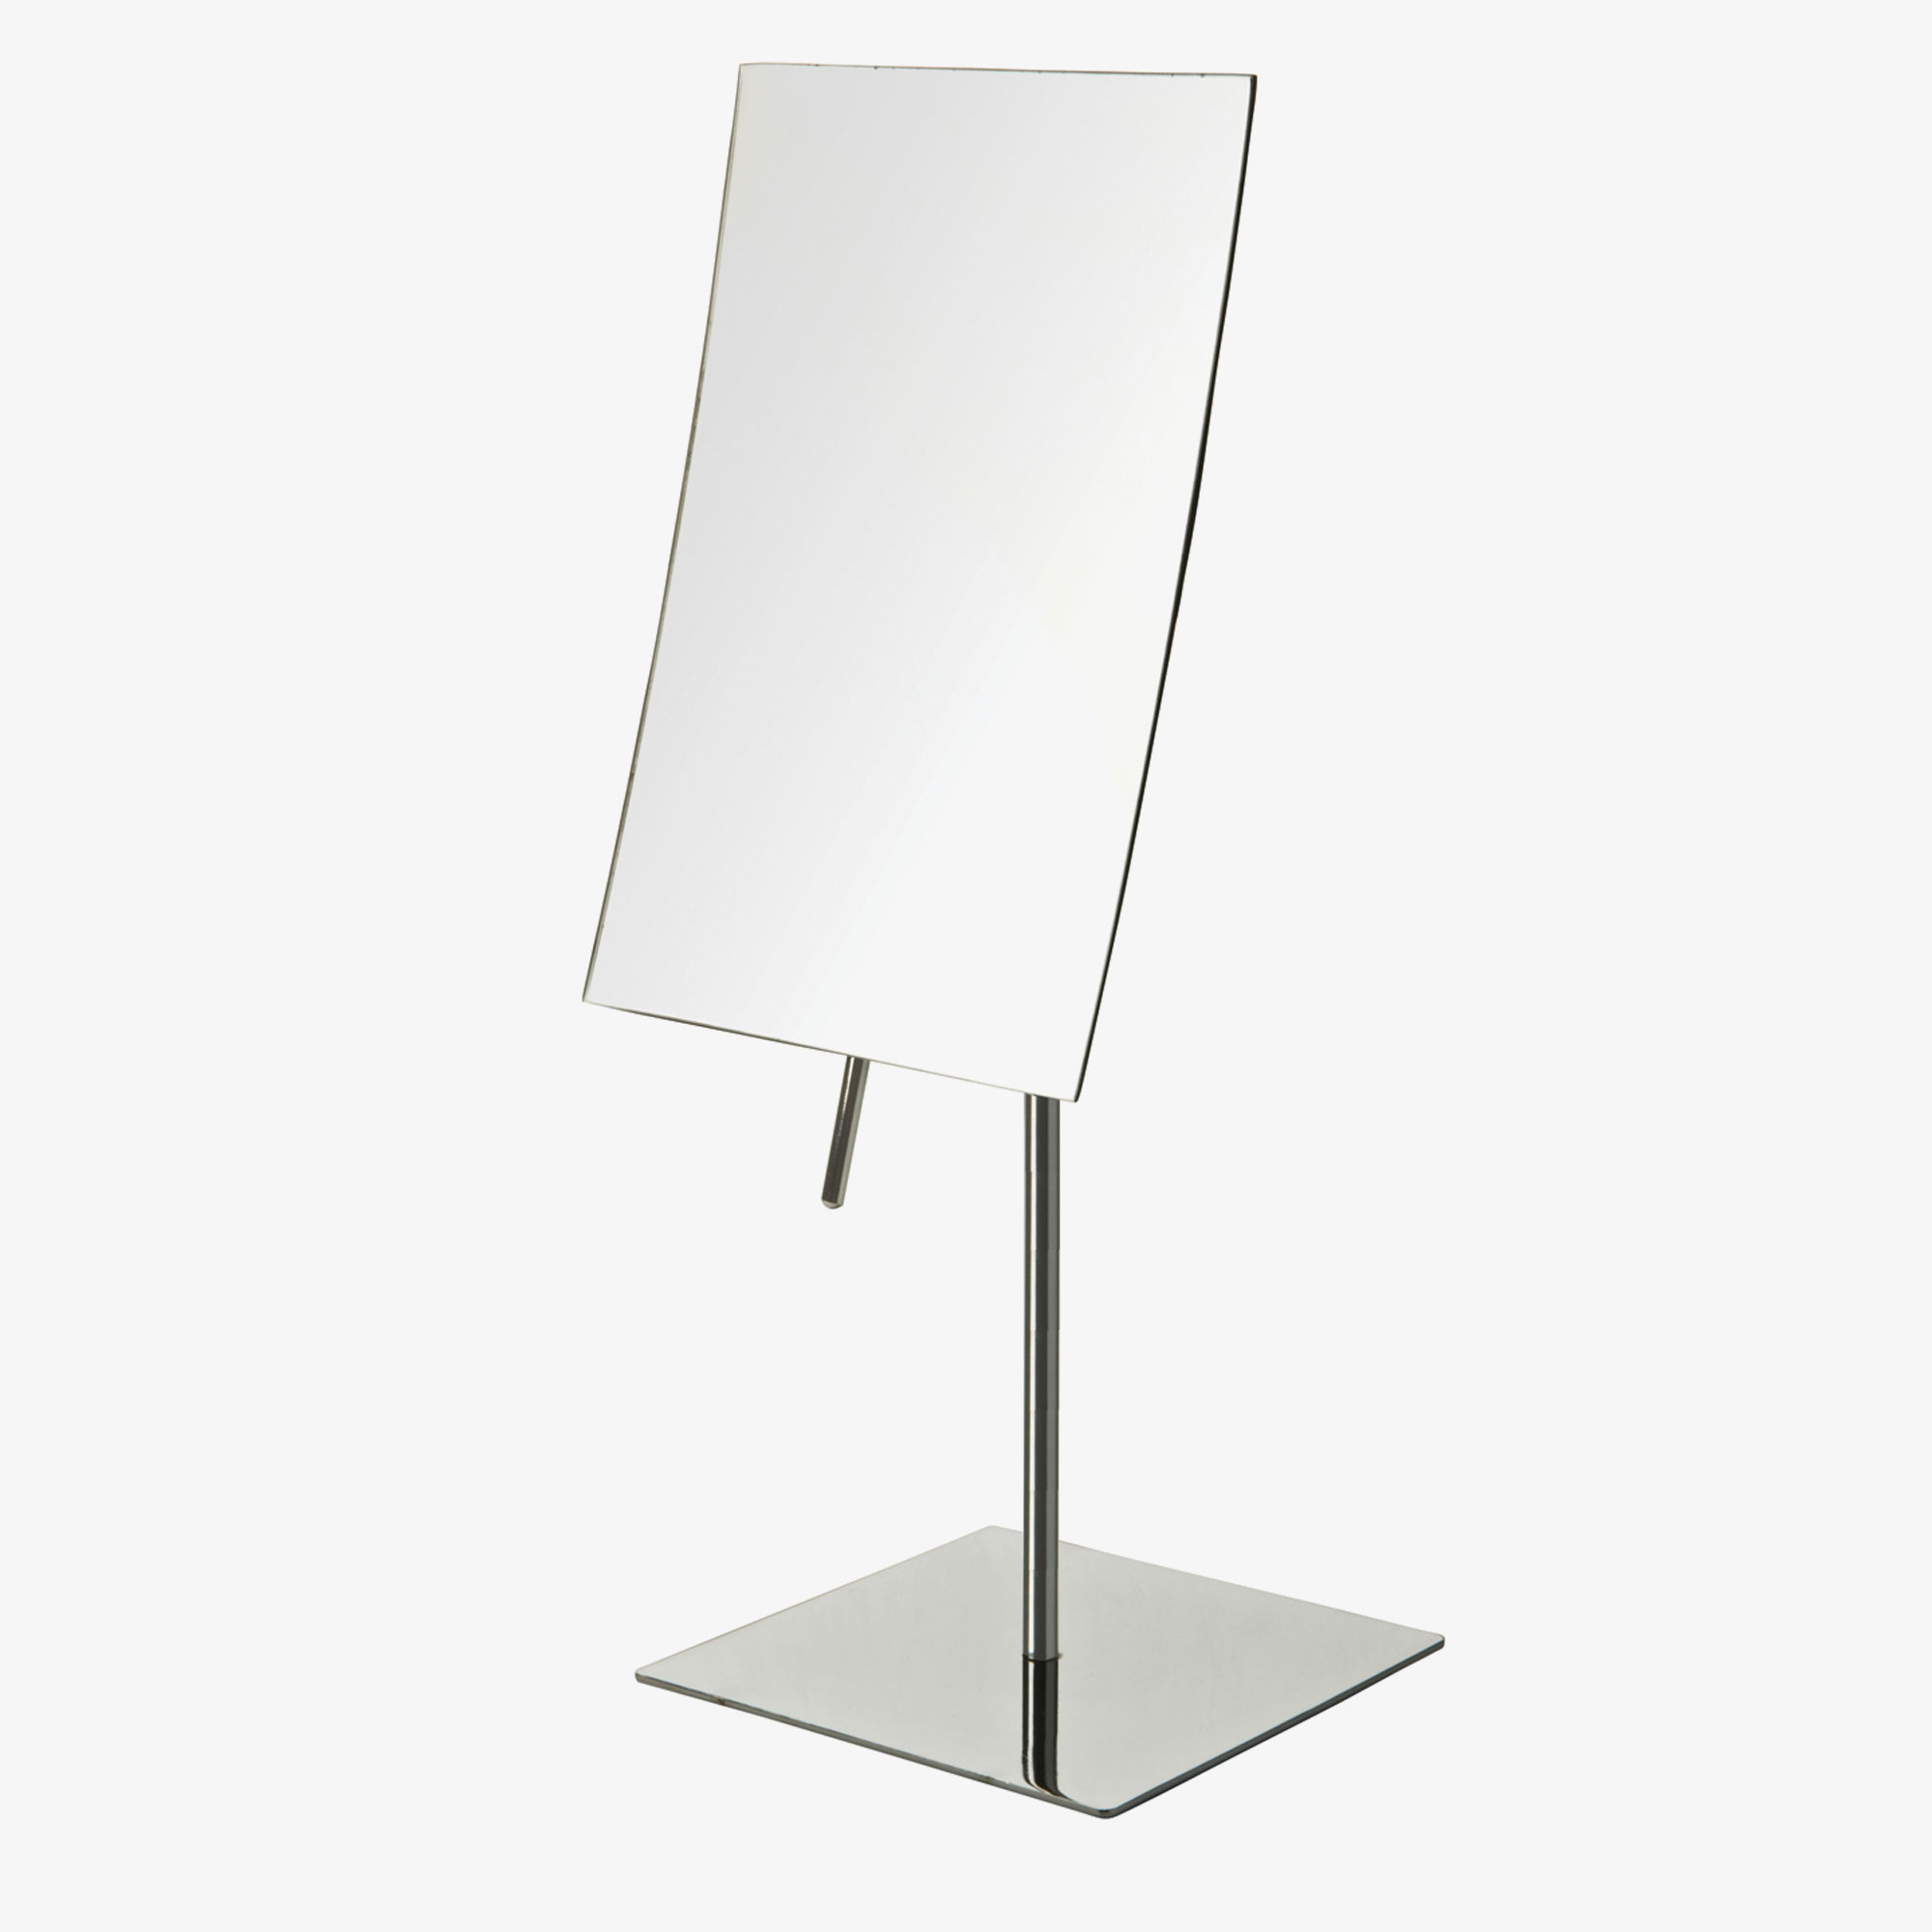 Jerdon Jp358c Rectangular Non Lighted Tabletop Mirror 3x